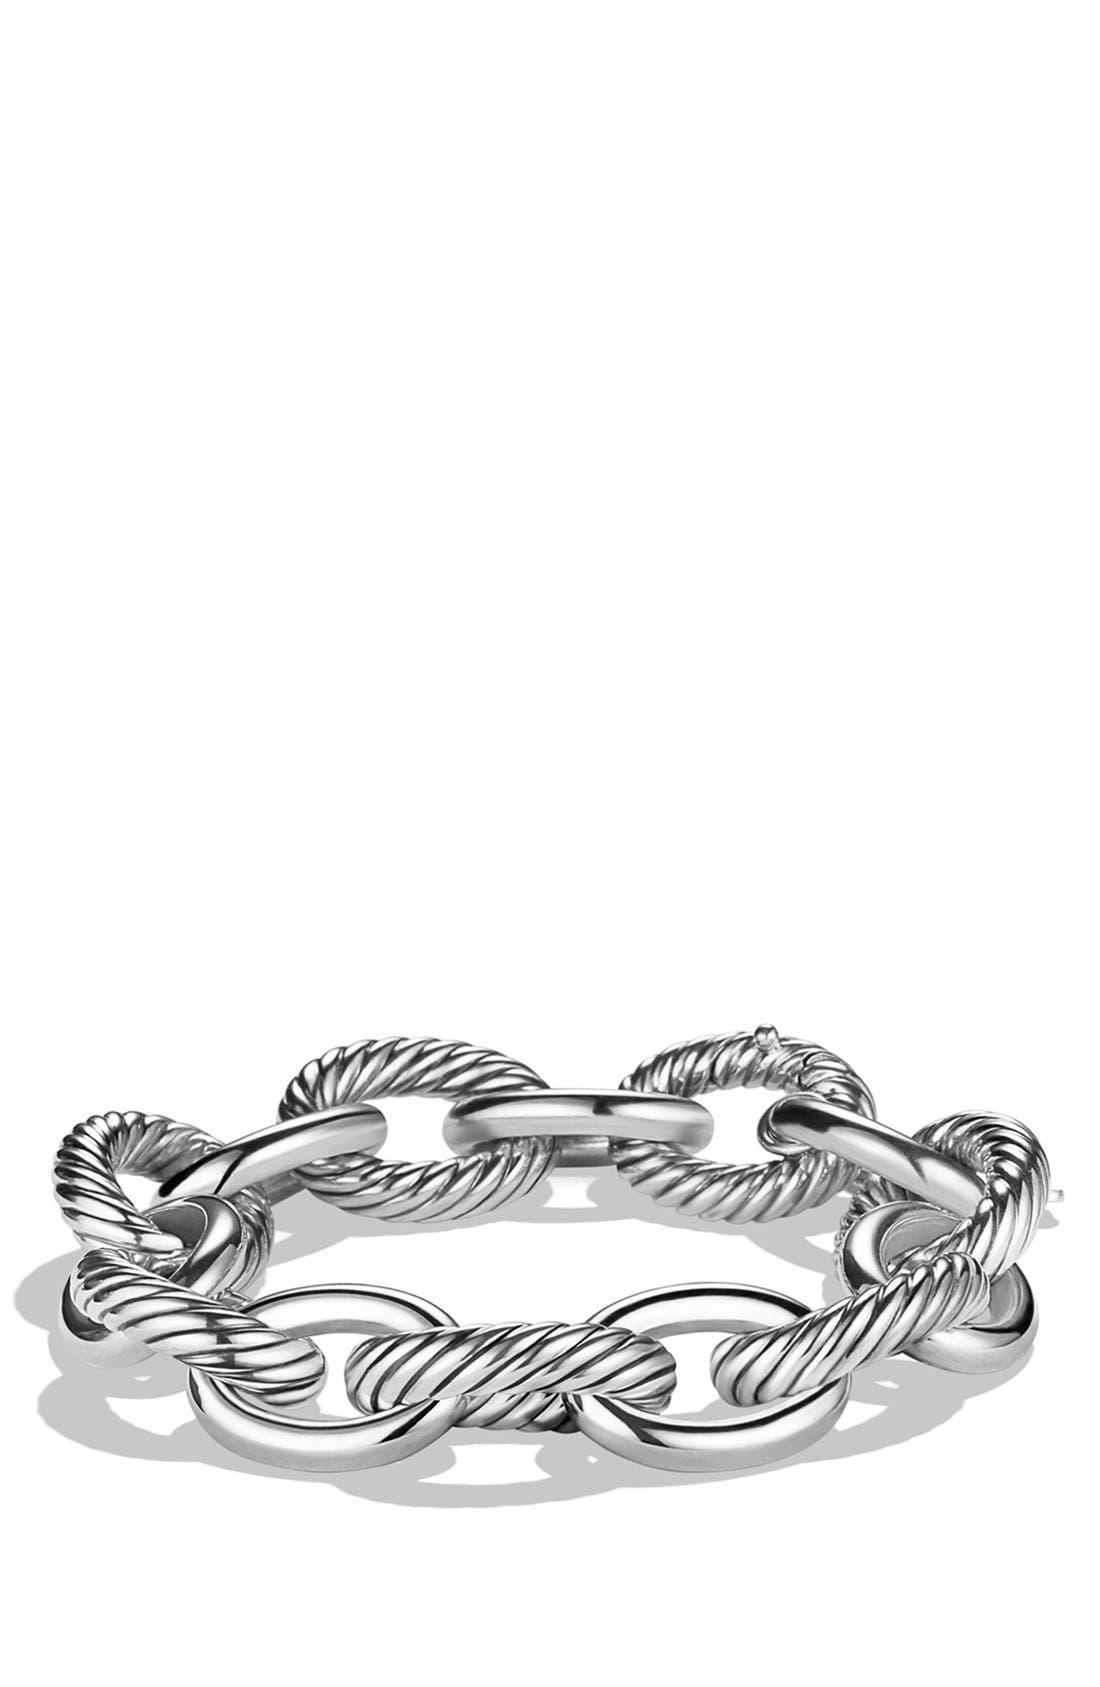 DAVID YURMAN, 'Oval' Extra Large Link Bracelet, Main thumbnail 1, color, SILVER